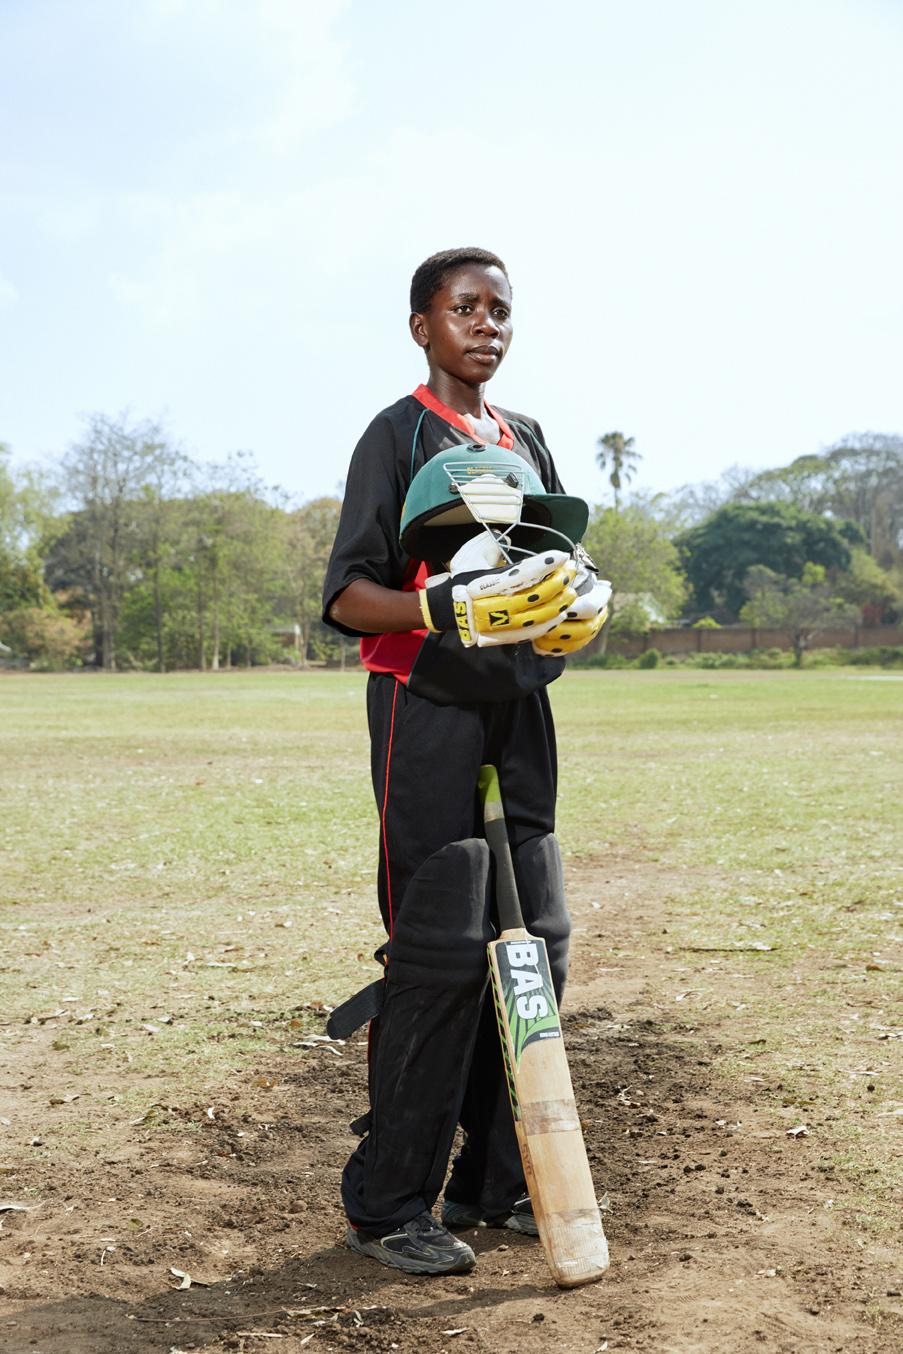 Tadala Mpandkwaya, batsman